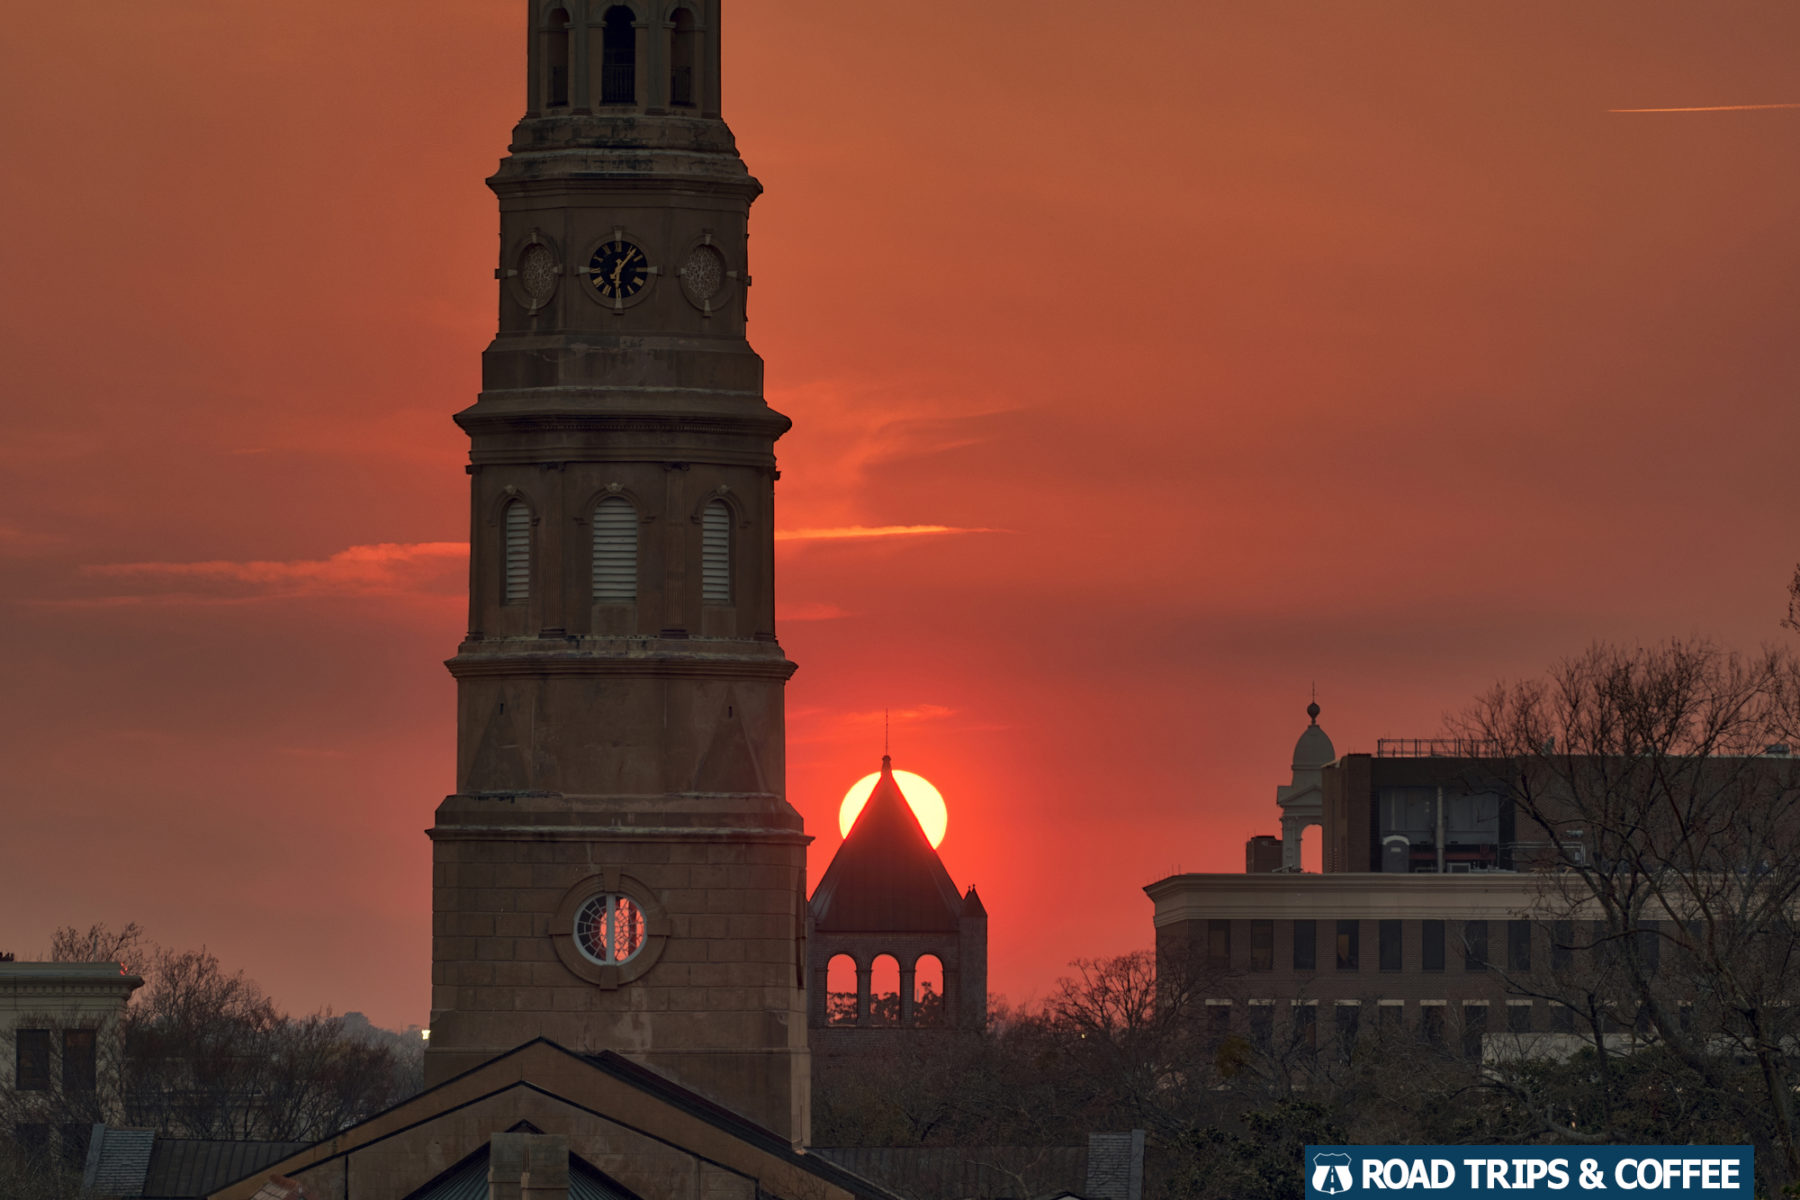 Sunset behind church steeples in Charleston, South Carolina